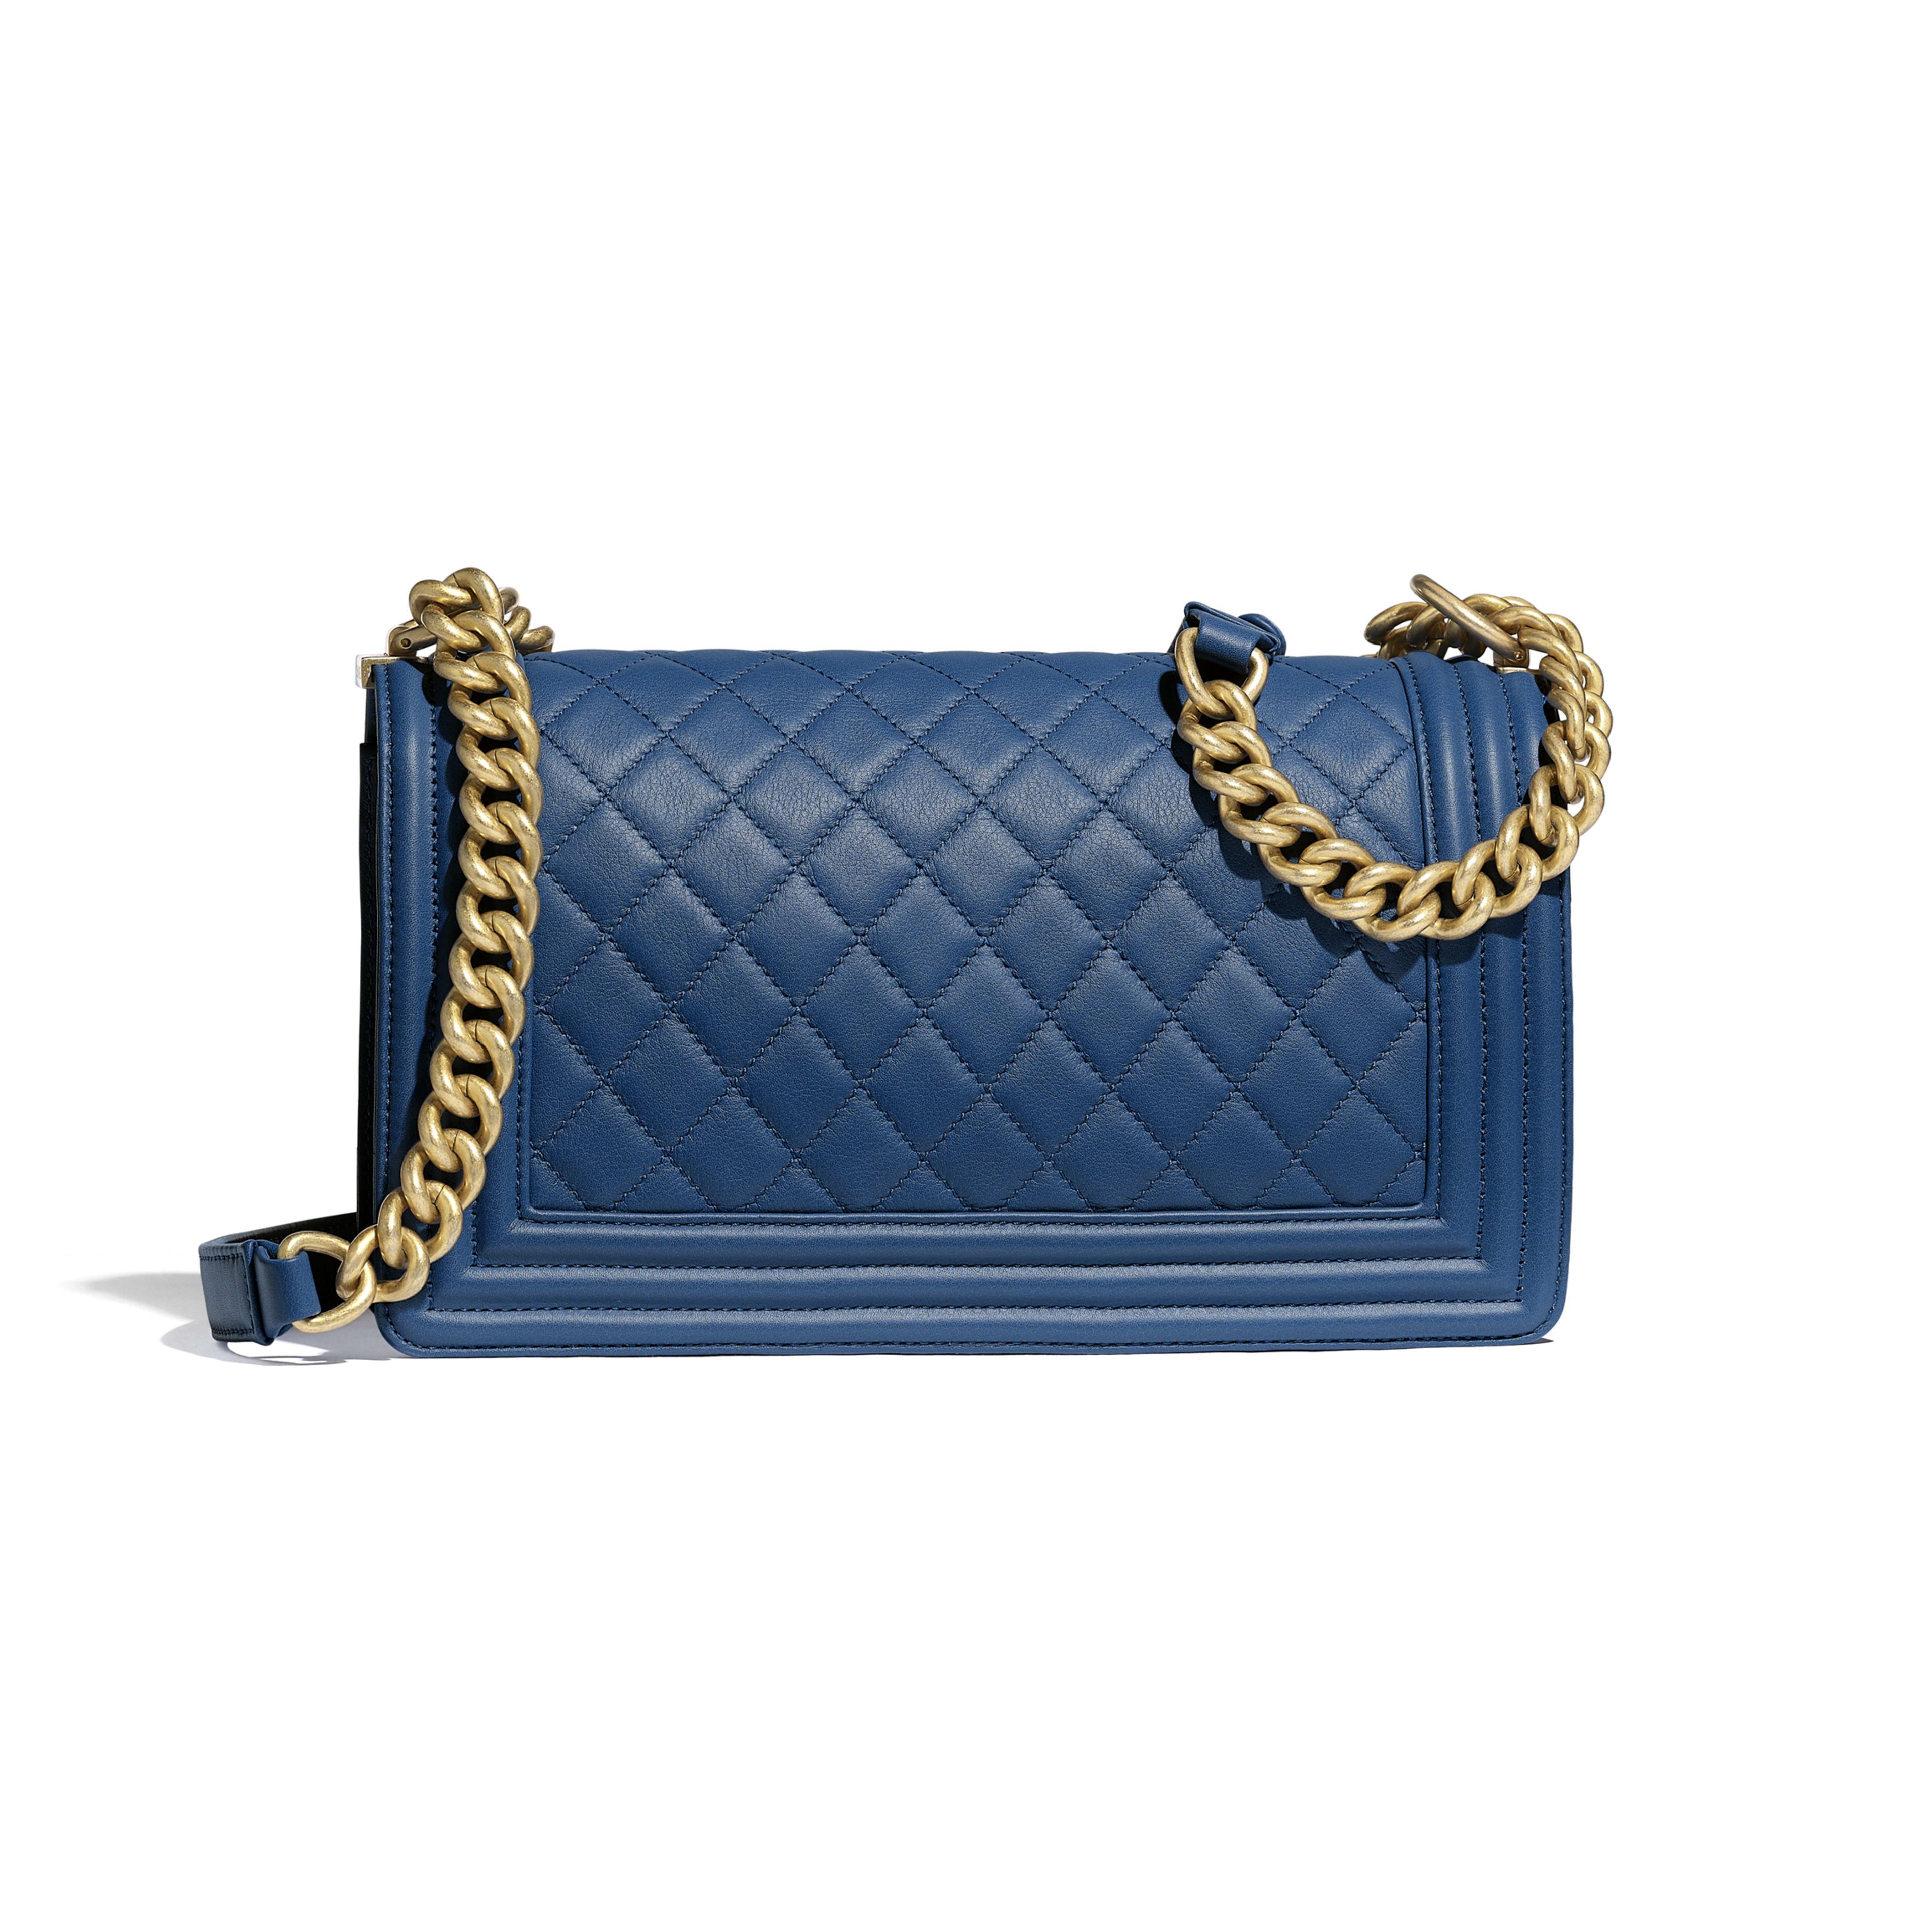 BOY CHANEL Handbag - Dark Blue - Calfskin & Gold-Tone Metal - Alternative view - see full sized version